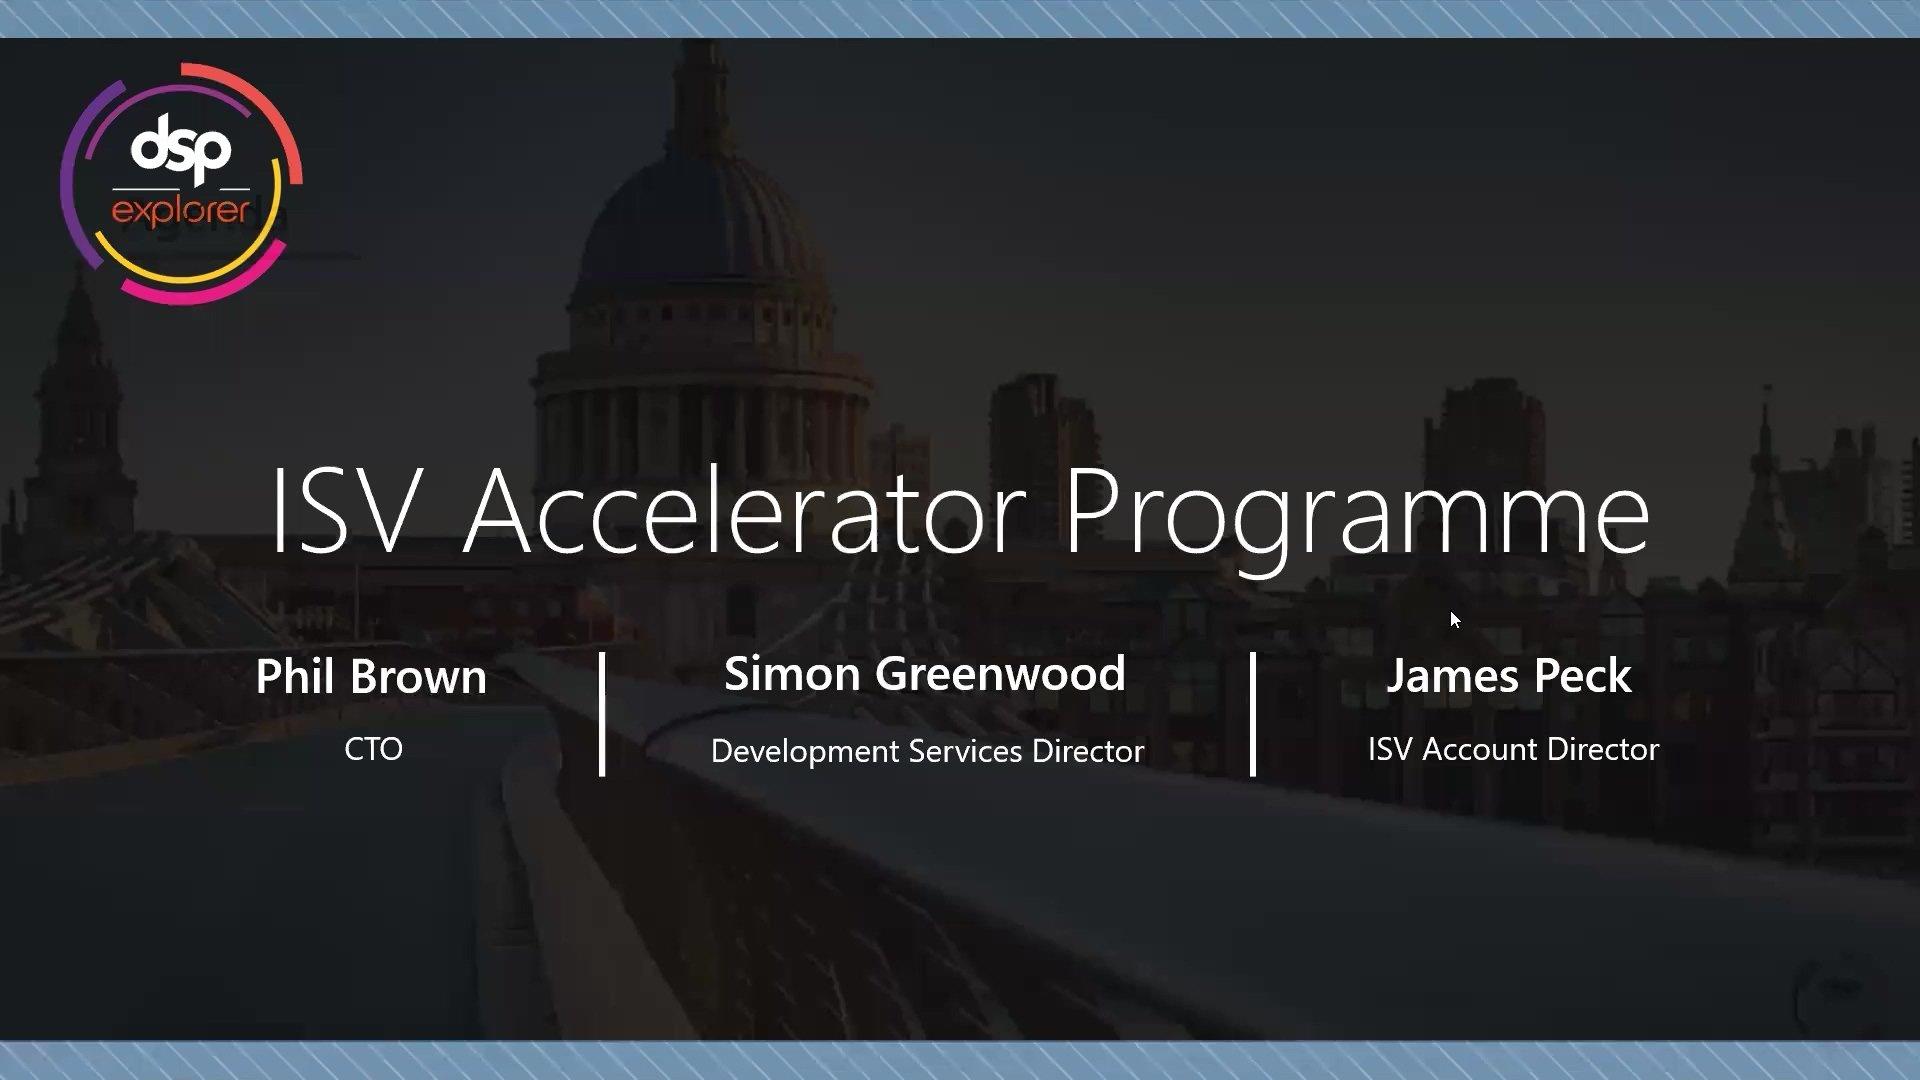 ISV Accelerator Programme On-Demand Webinar